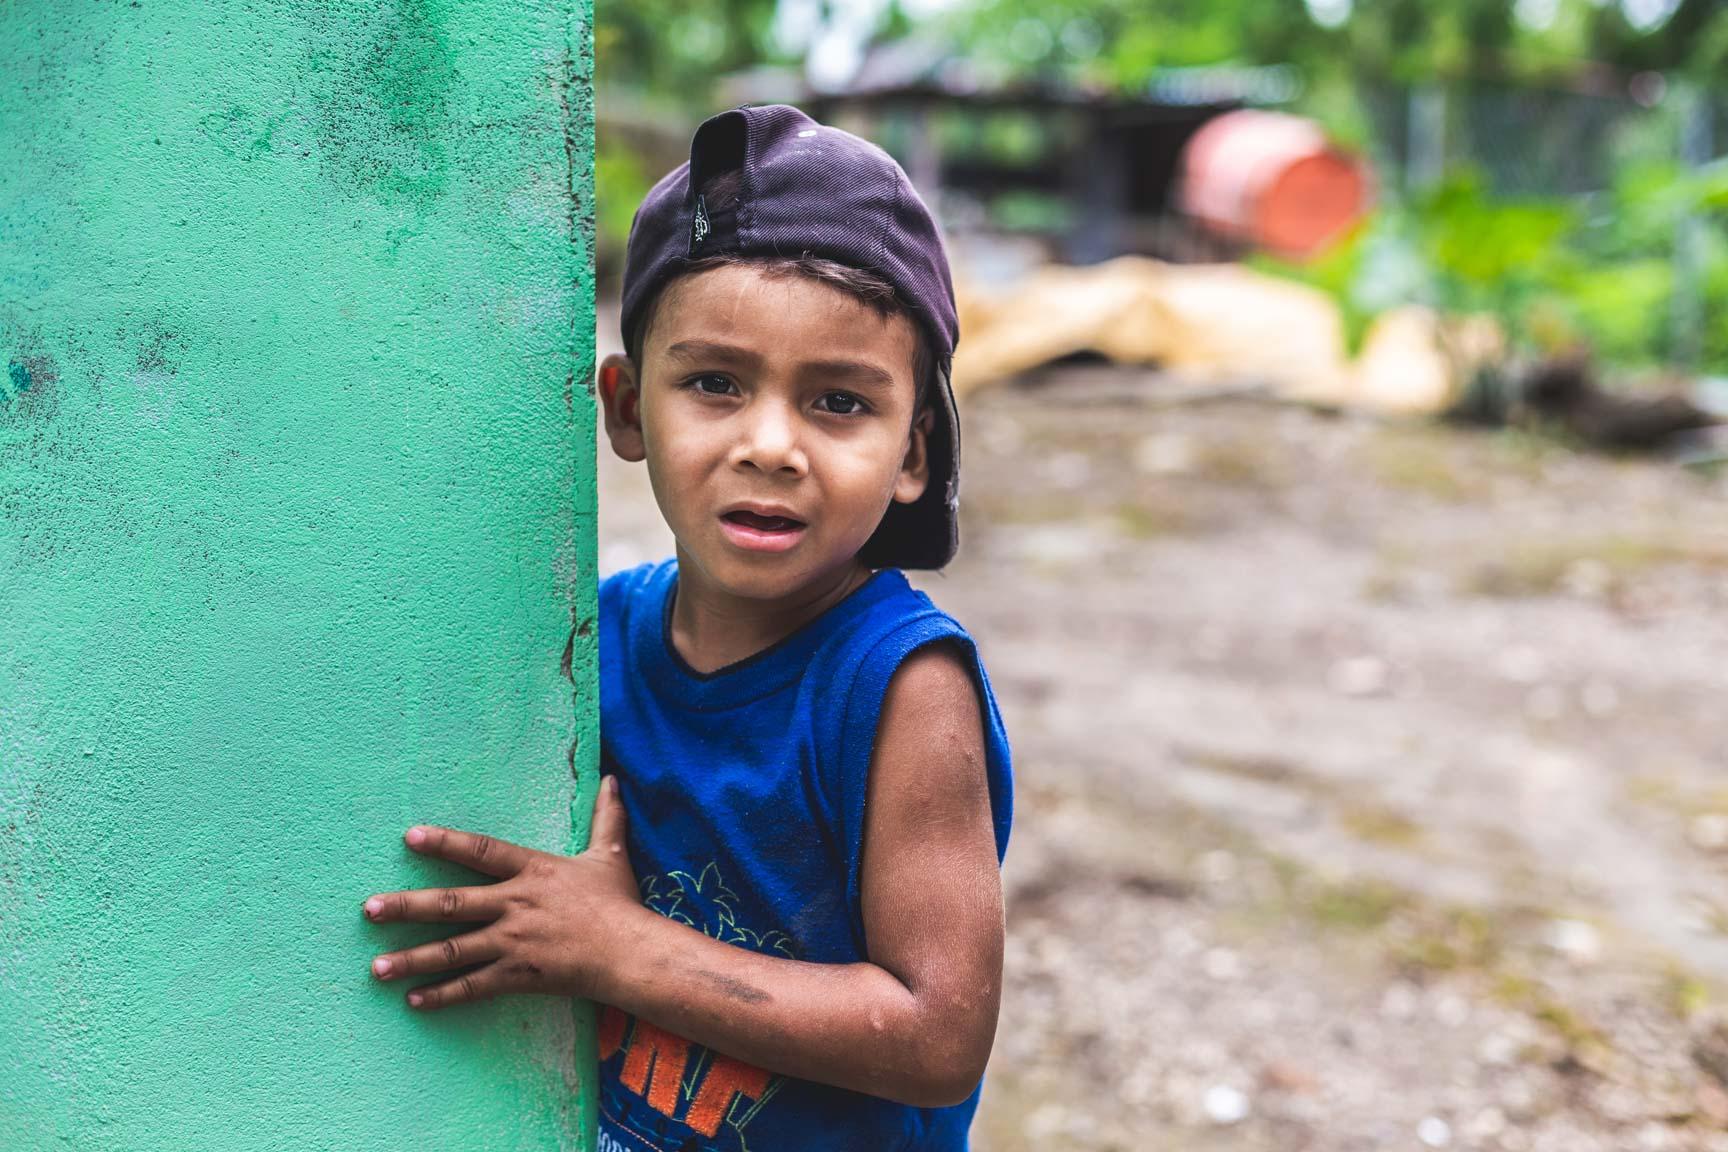 Adam-Szarmack-Panama-Mission-Trip-Eleven22-83.jpg